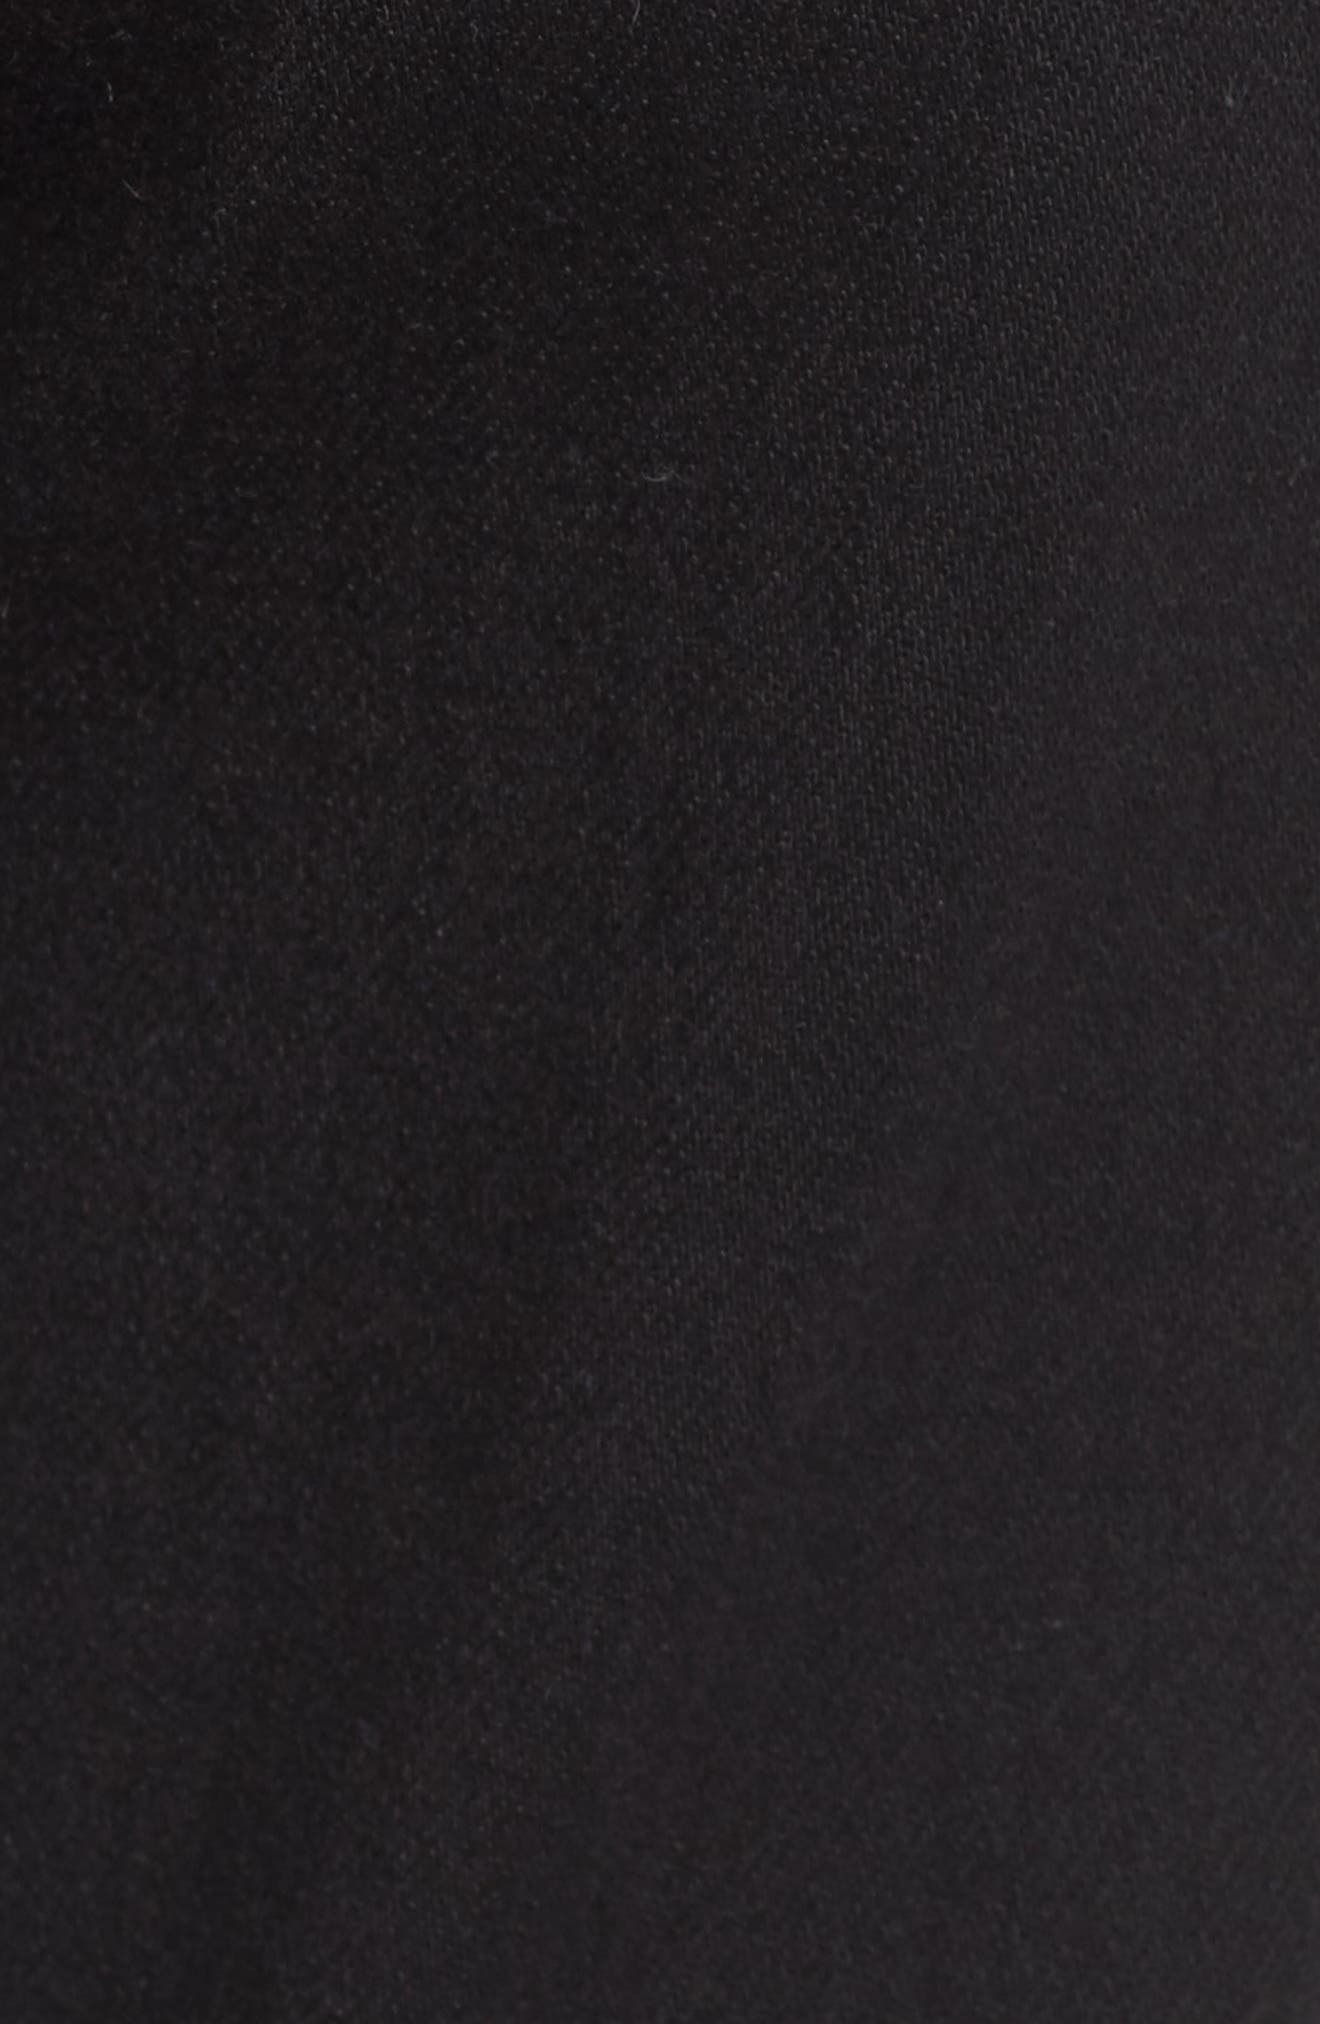 Priscilla High Waist Crop Flare Jeans,                             Alternate thumbnail 5, color,                             004